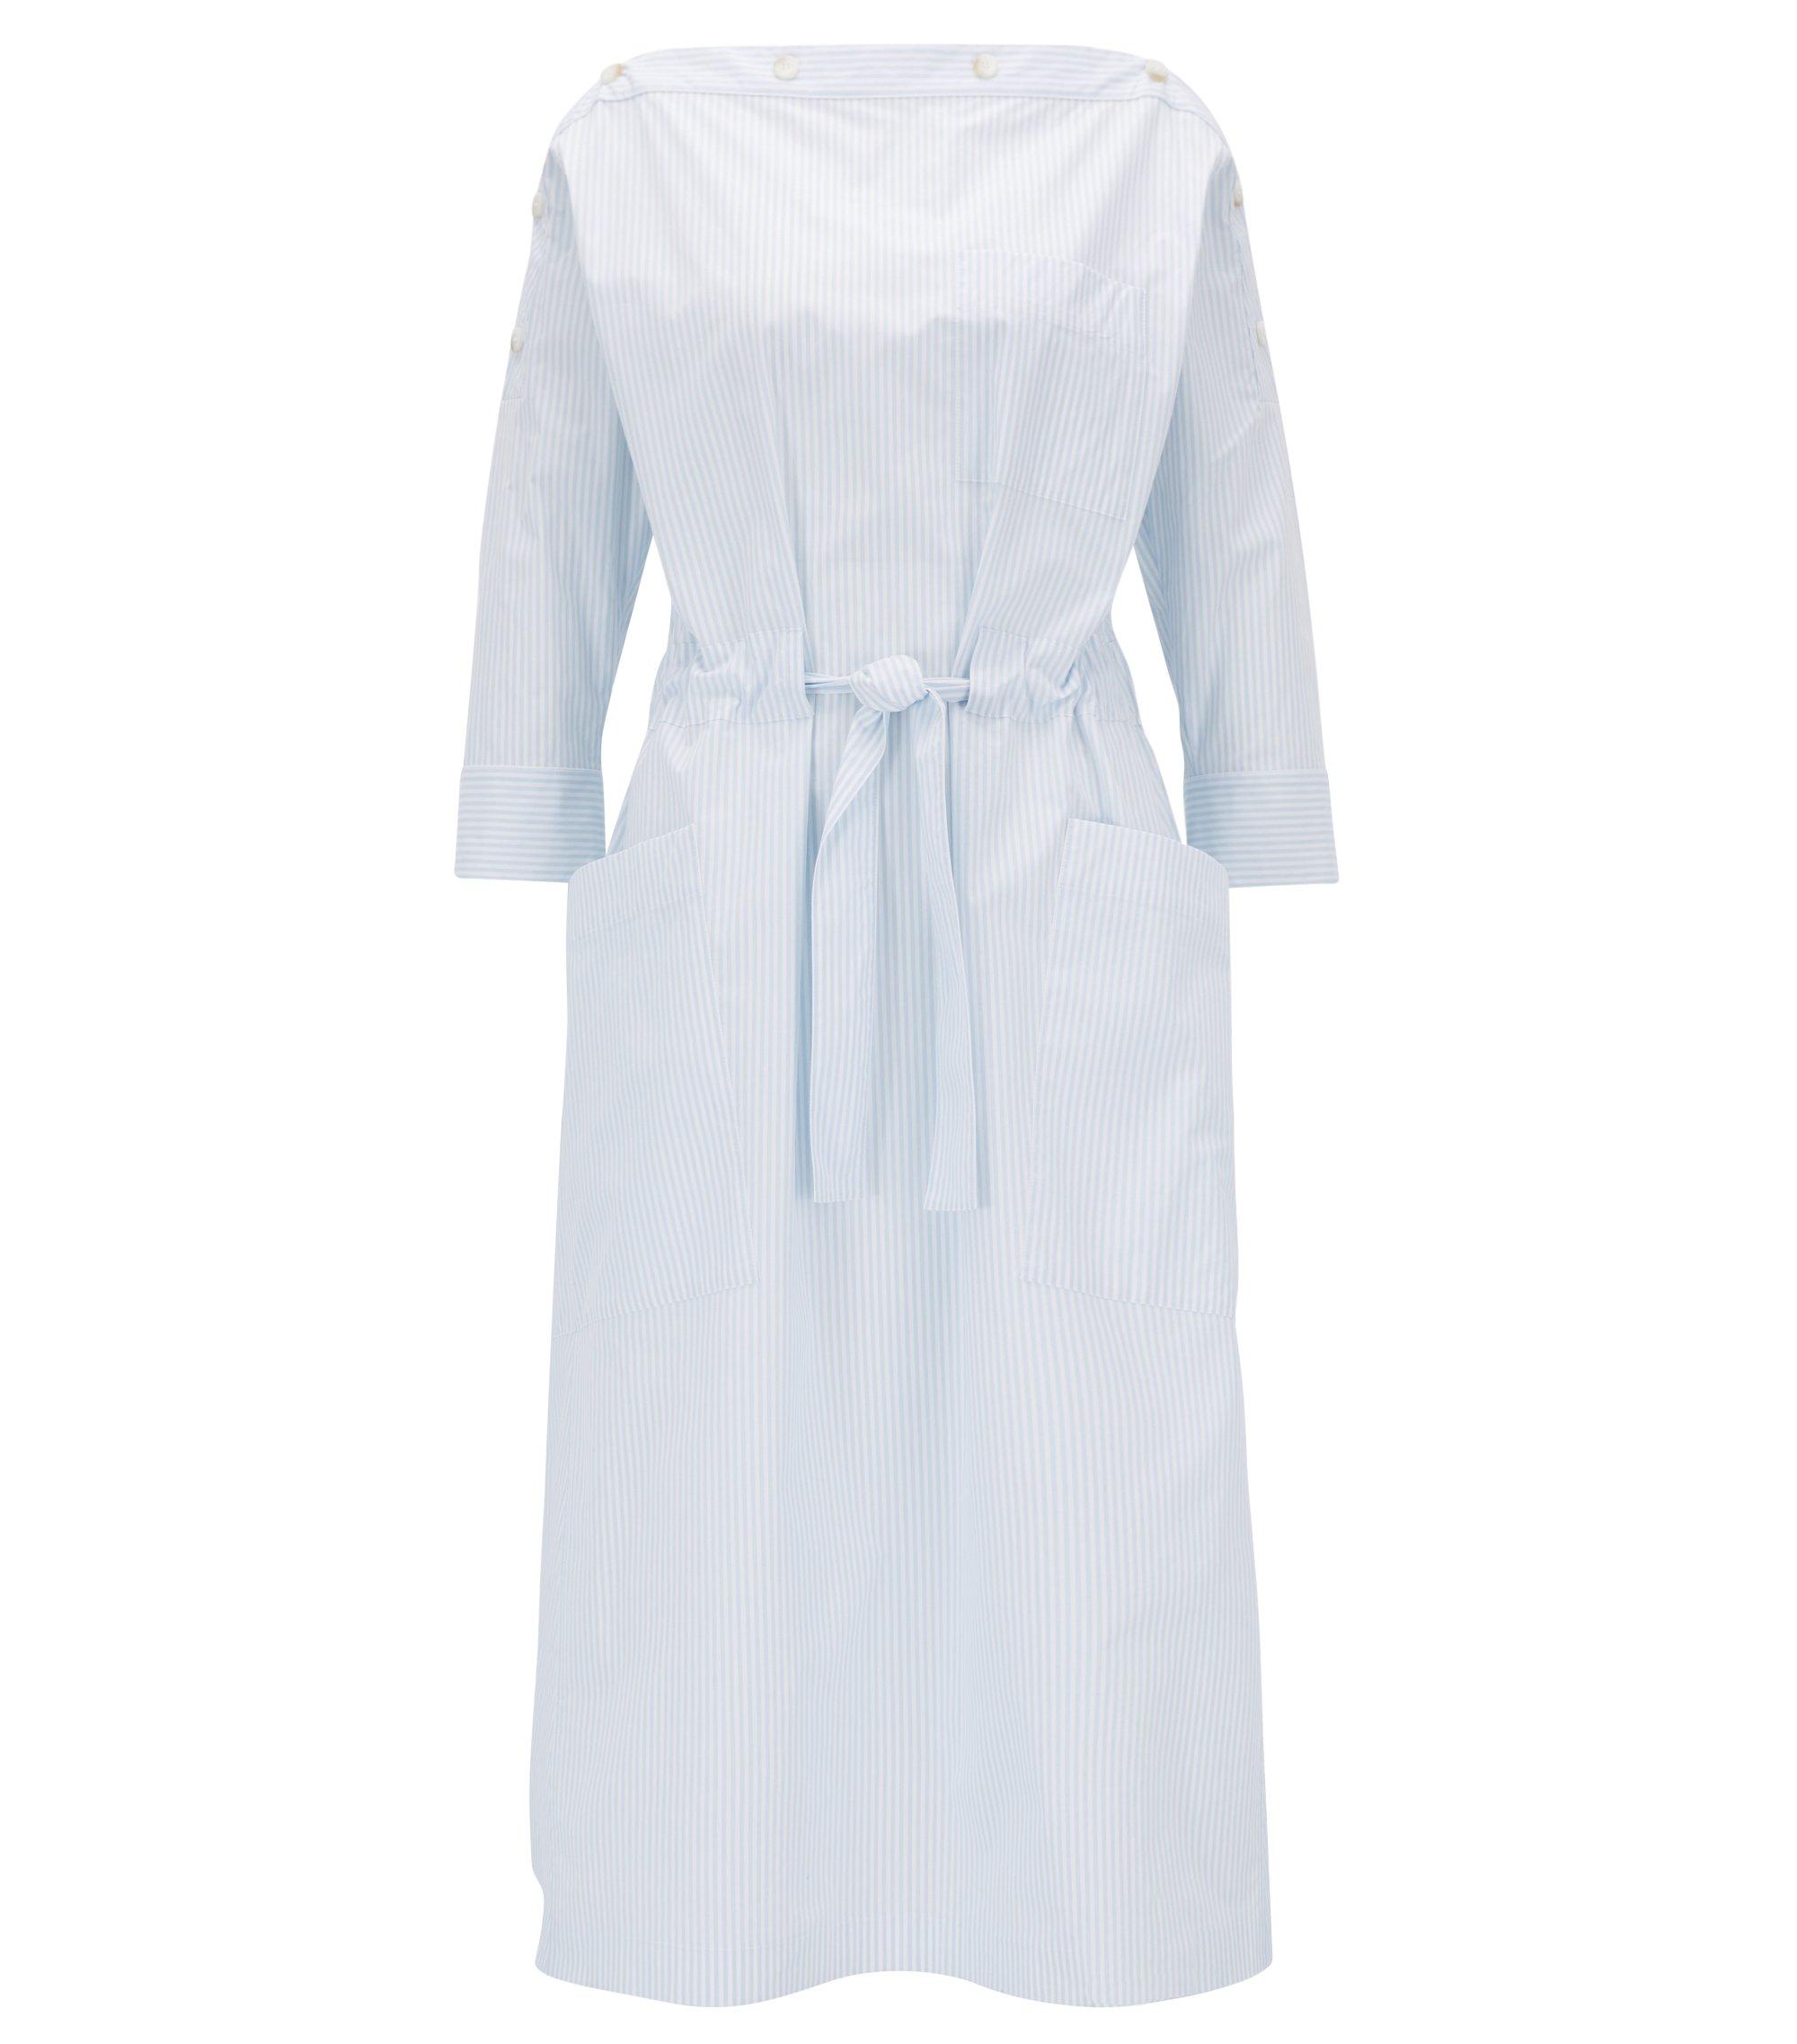 Button-neckline striped summer dress, Patterned